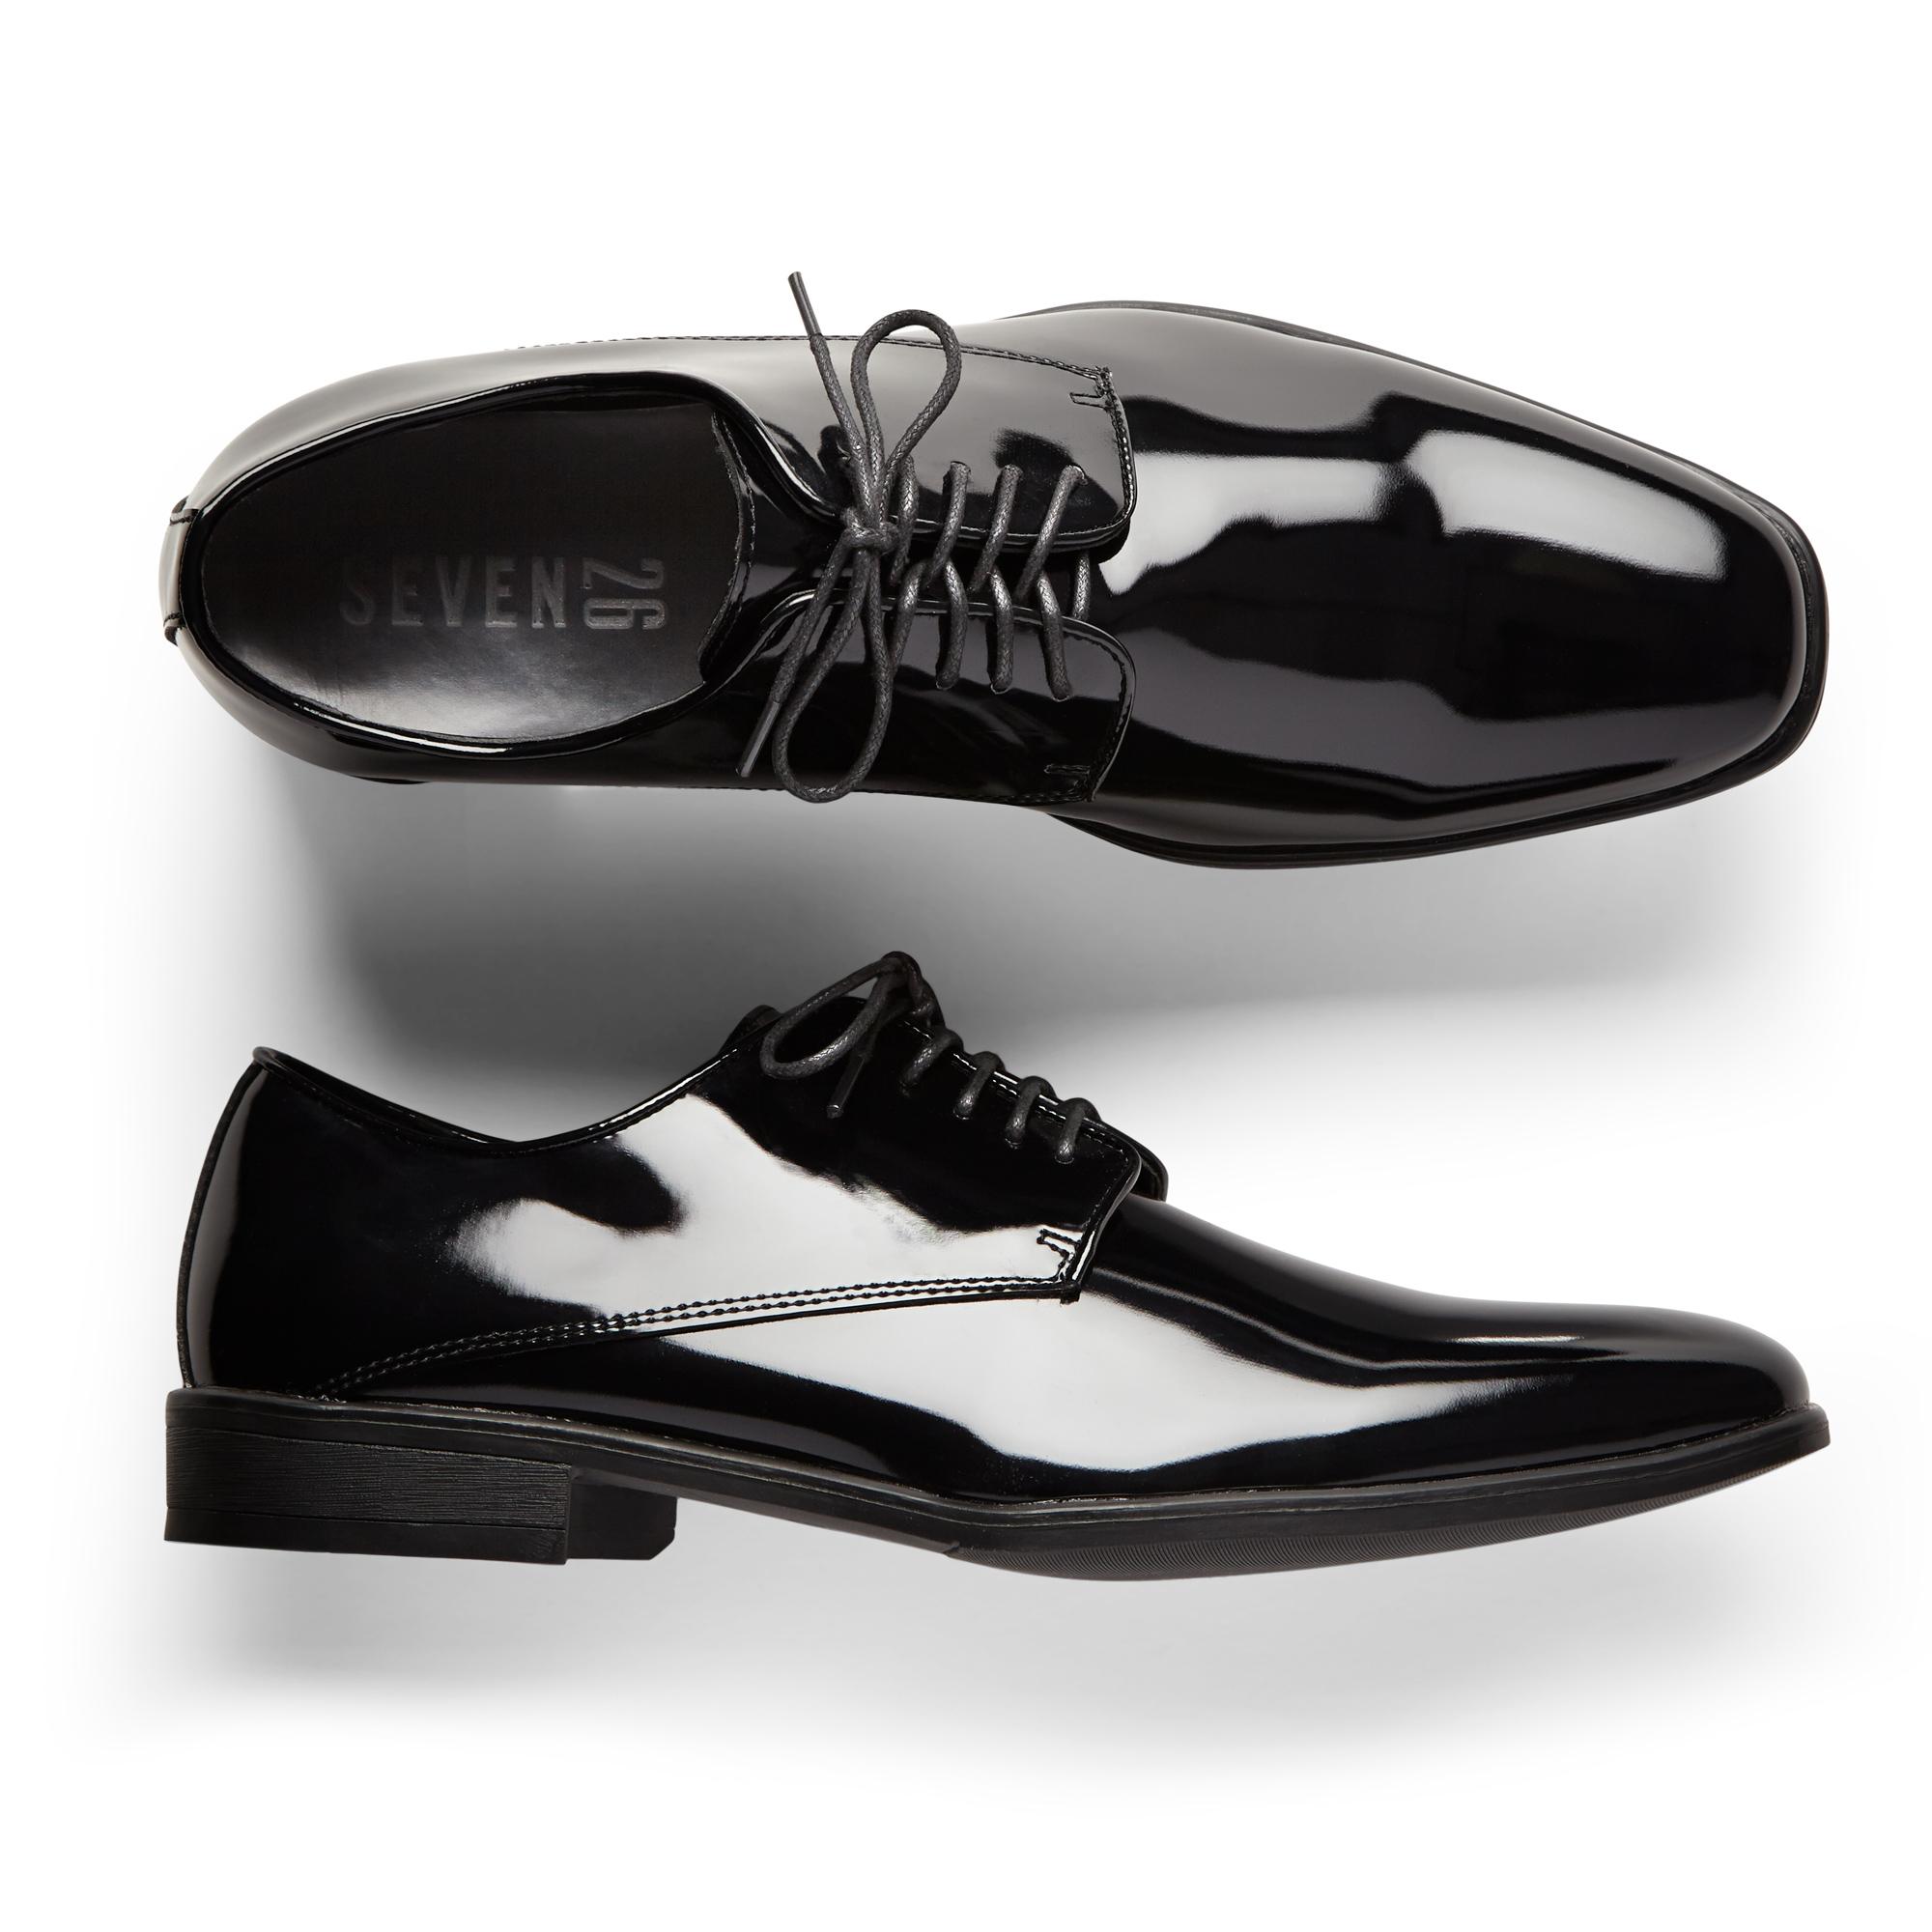 Glossy Black Tuxedo Shoes | Generation Tux